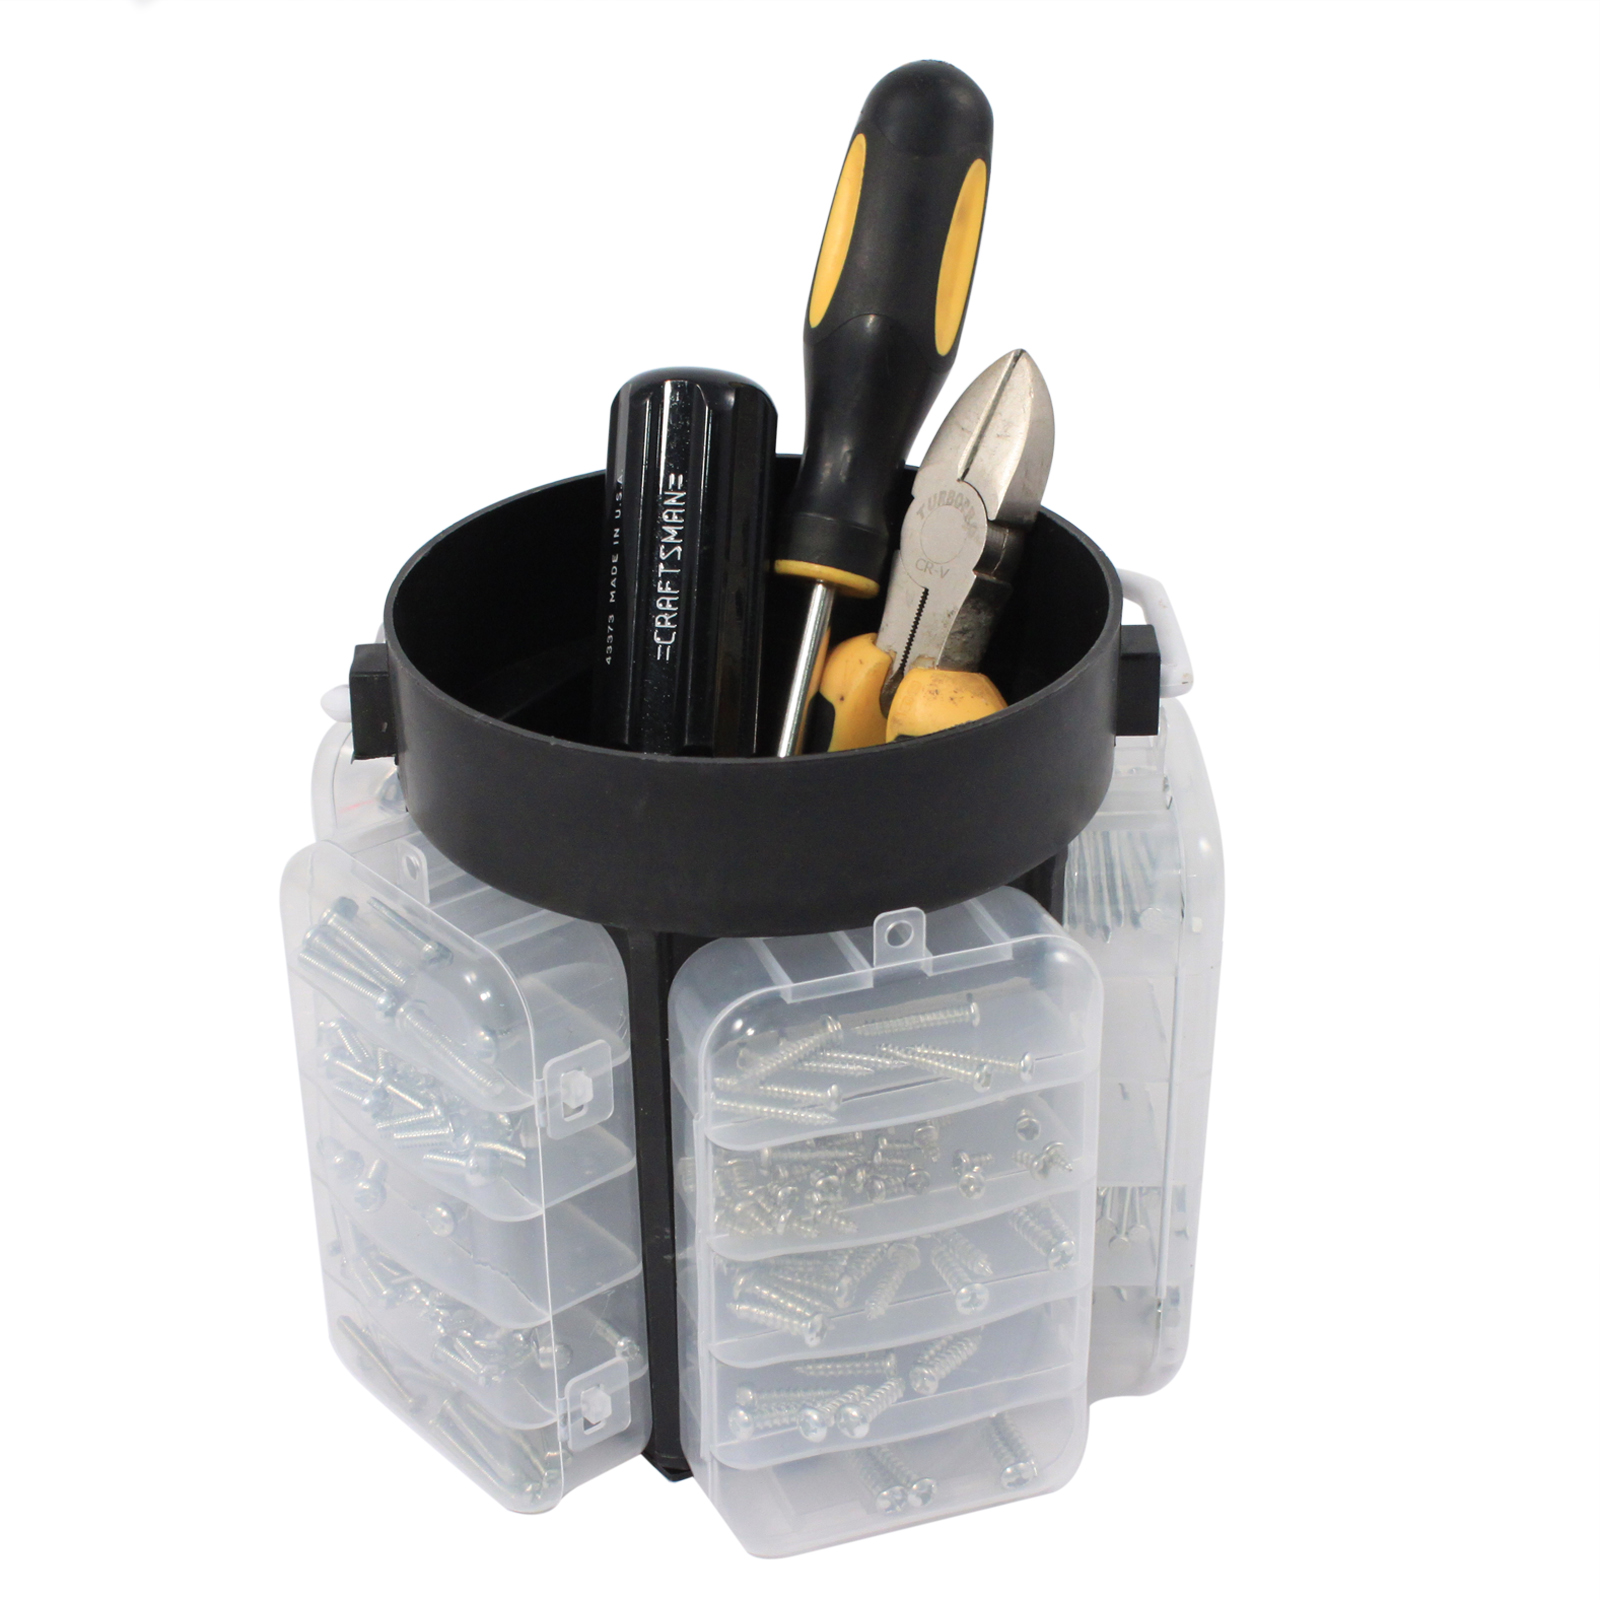 Tool Box Hardware Caddy 600 Part Organizer